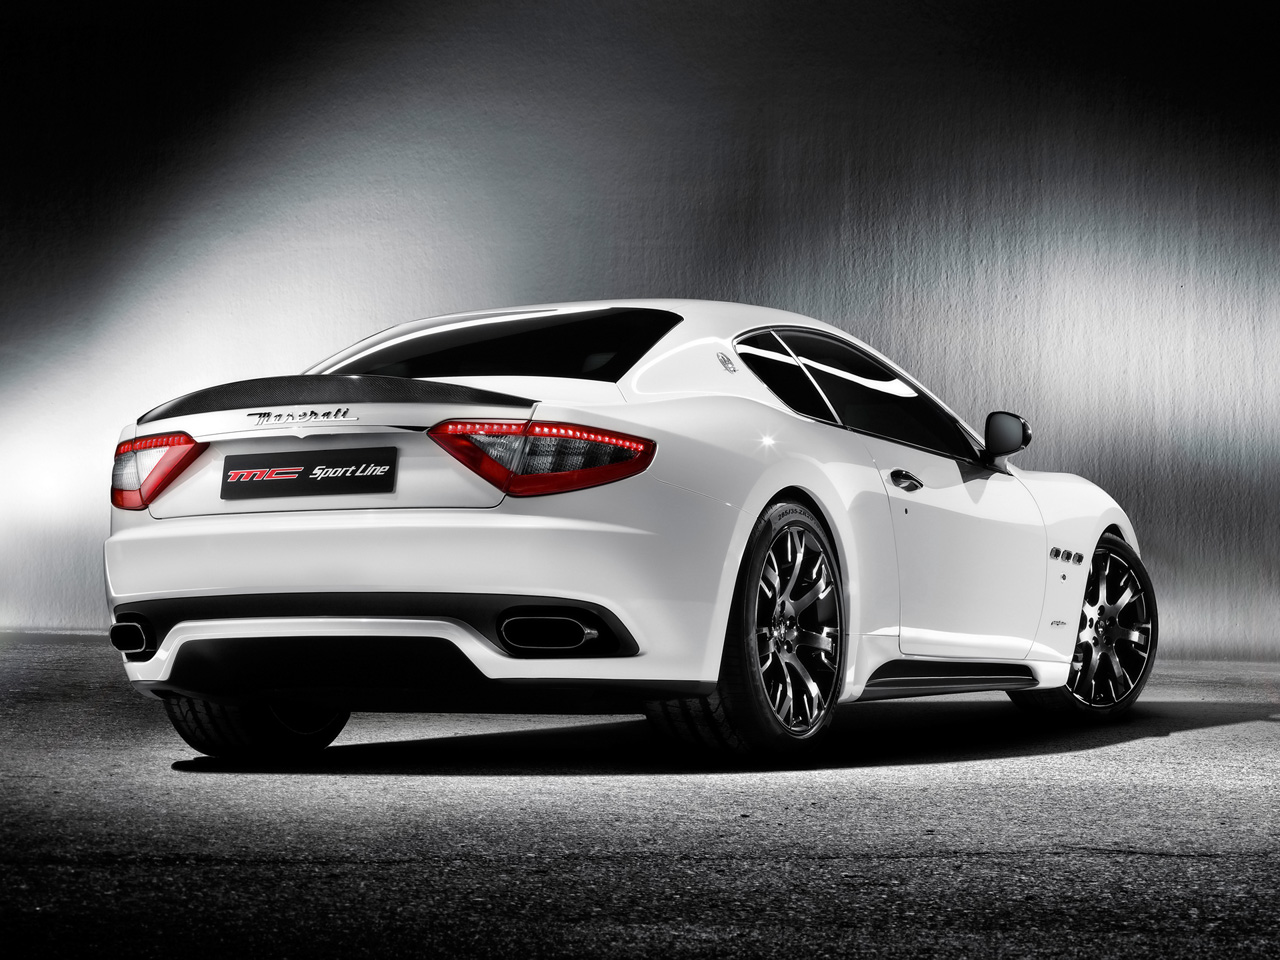 Maserati+cars+2009